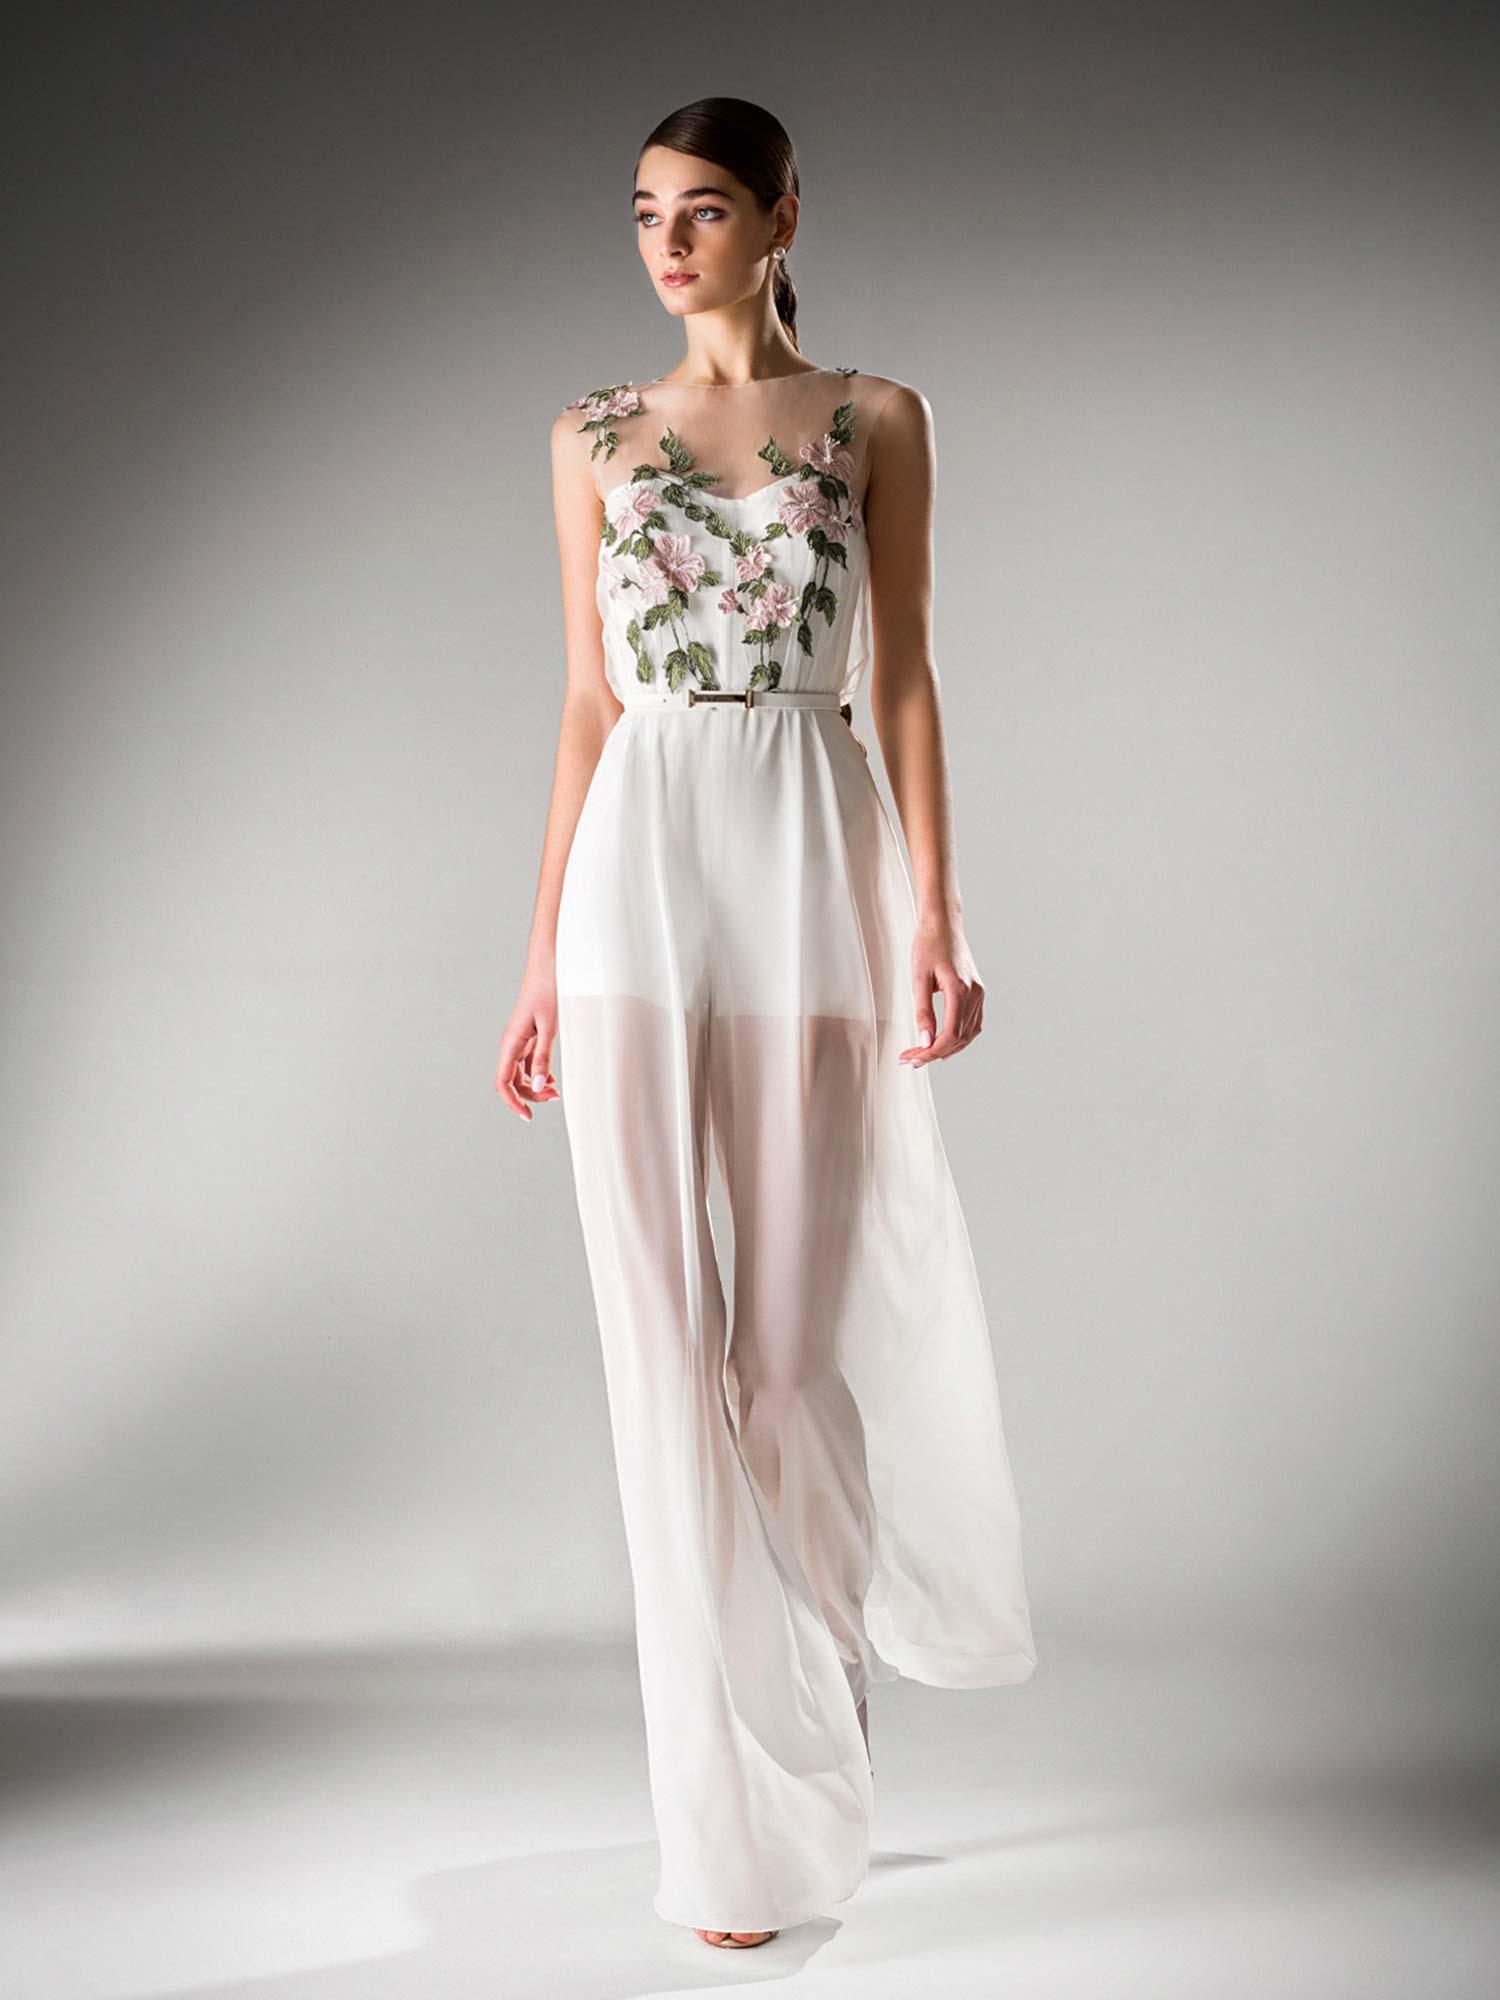 Style #410